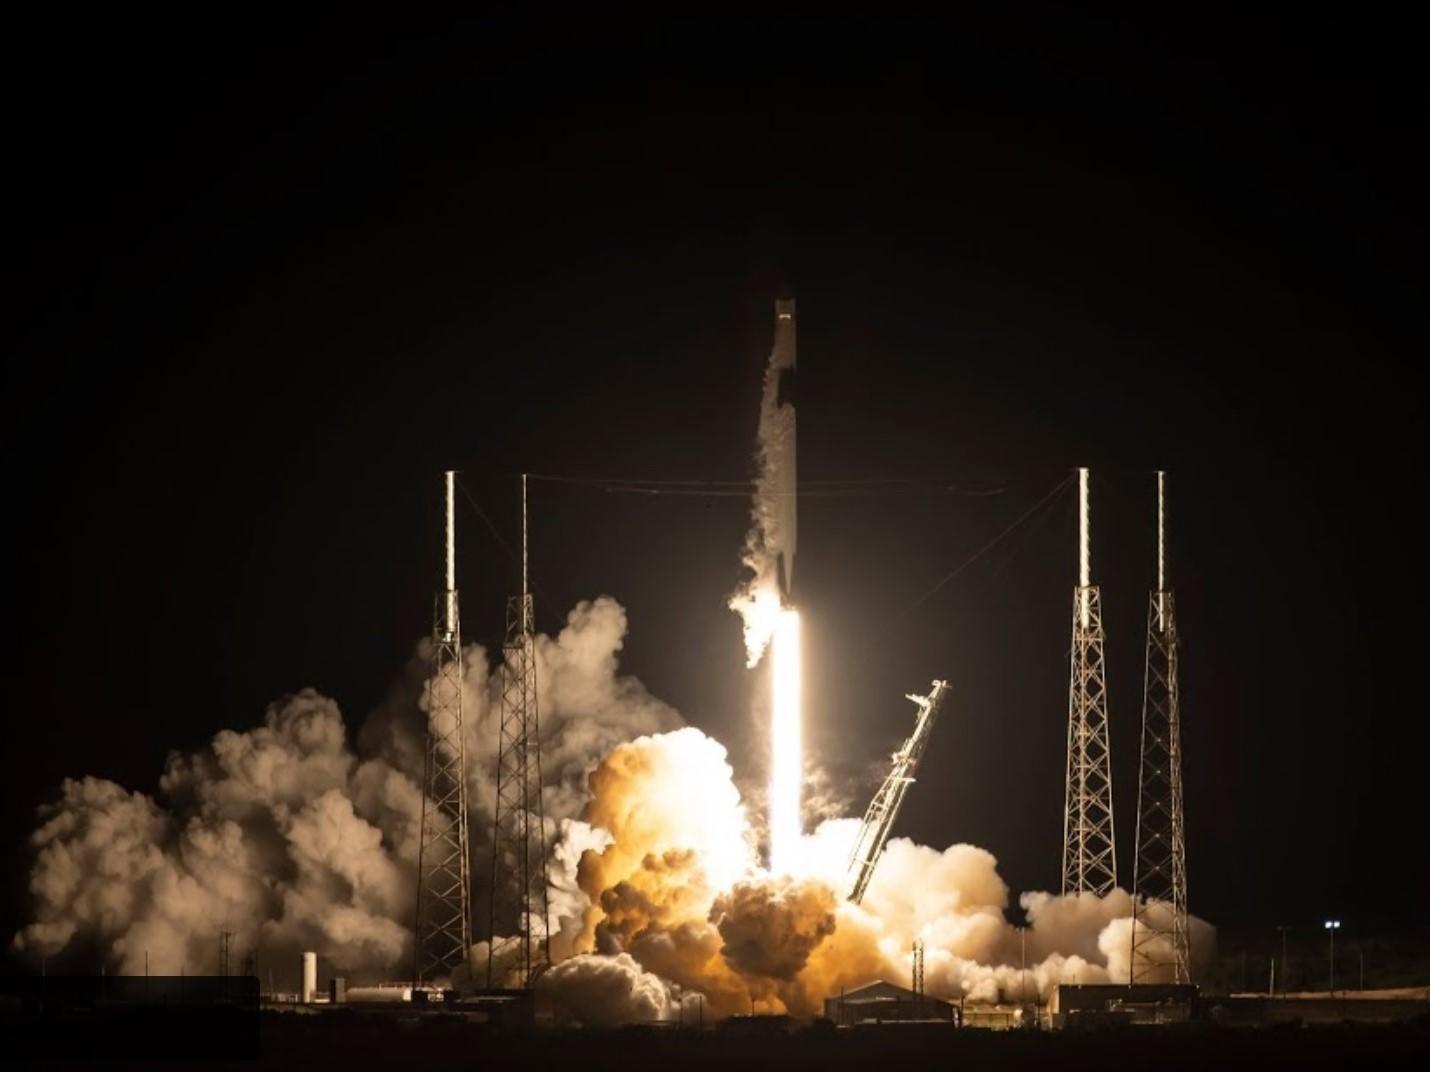 SpaceX launch: Watch live stream as Elon Musk sends internet